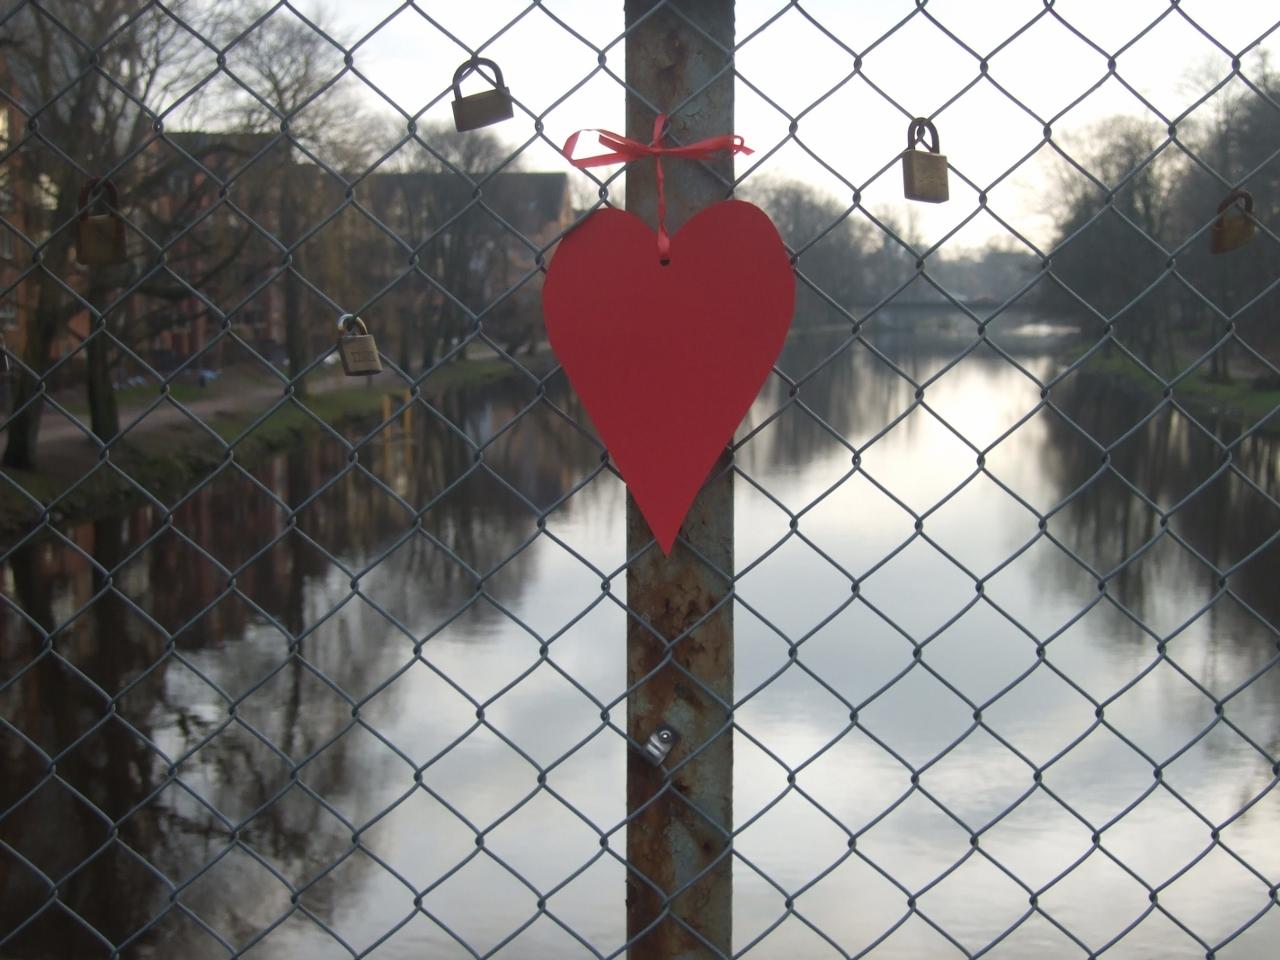 2014-02-14 Alla hjärtans dag Pyttebron 020 (1280x960)